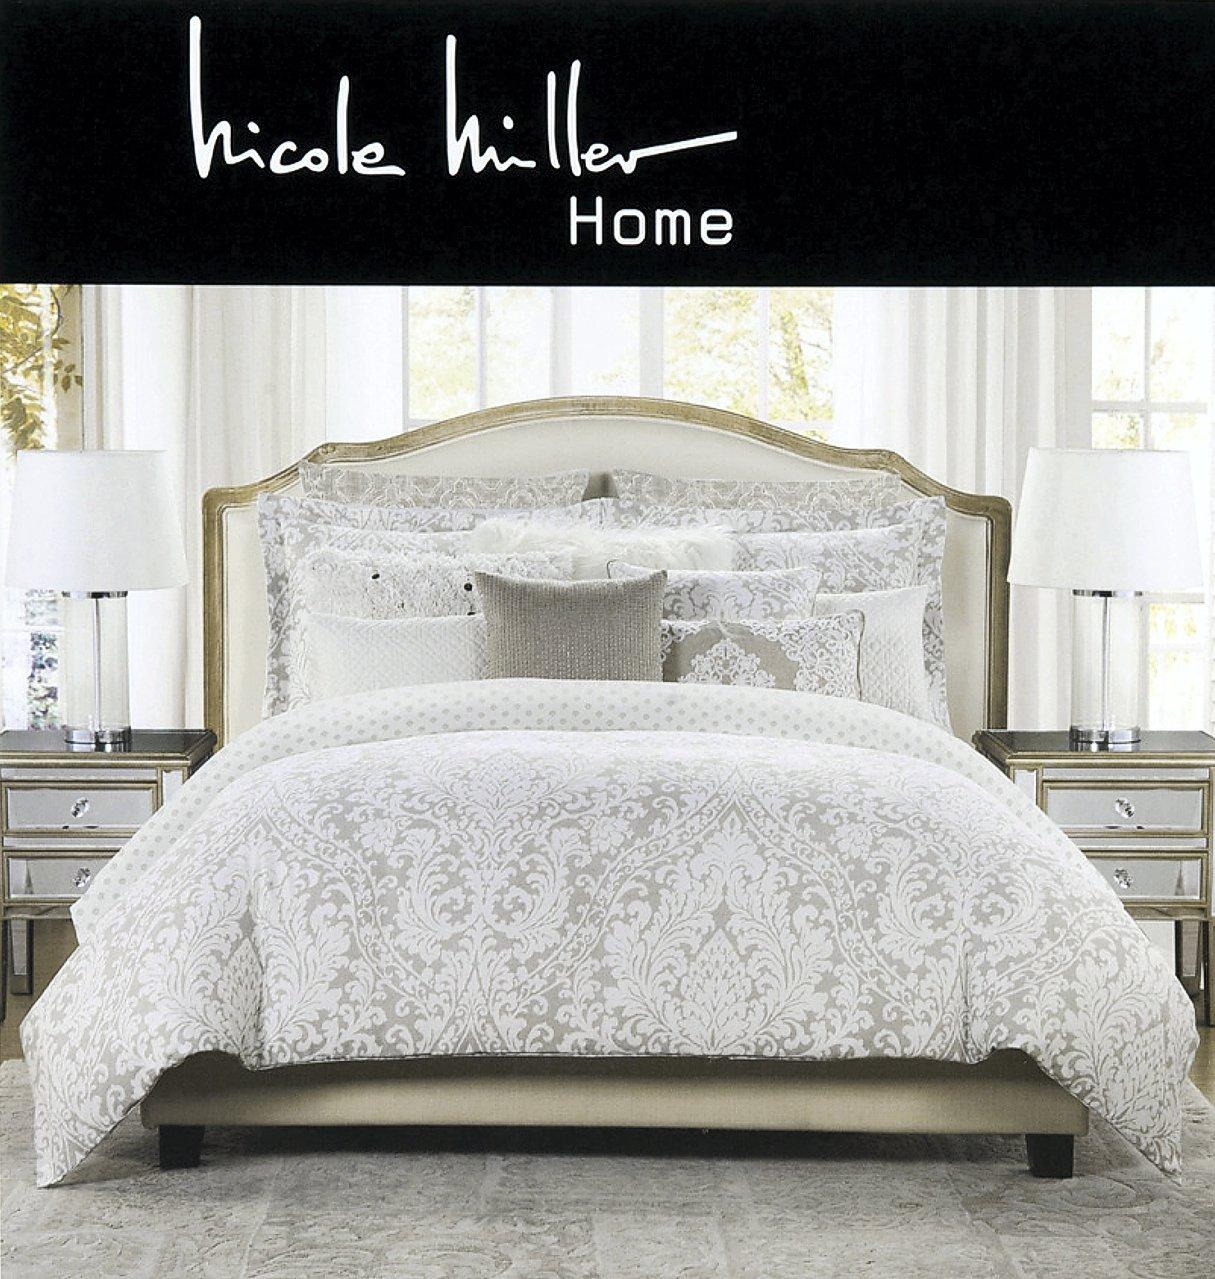 tan duvet cover. Nicole Miller 3 Pc King Duvet Cover Set Beige Tan Watercolors Medallion Floral Luxurious Bedding Cotton I